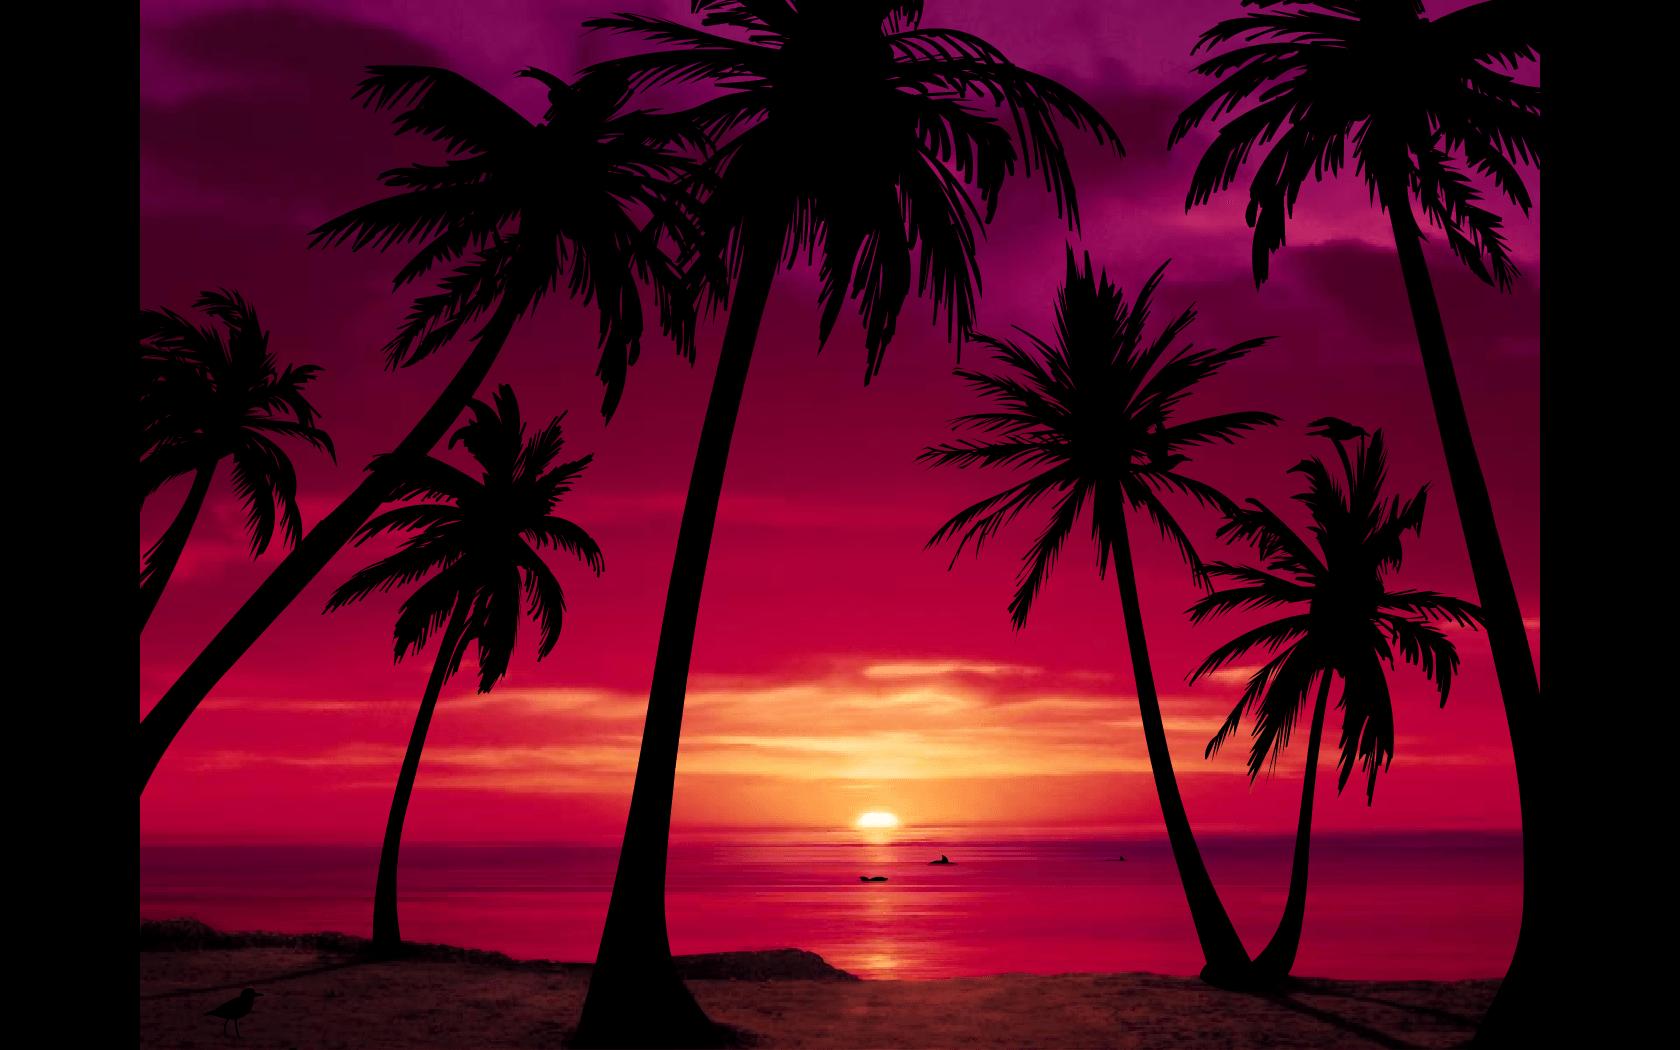 Barbie screensavers wallpapers wallpapersafari - Free palm tree screensavers ...